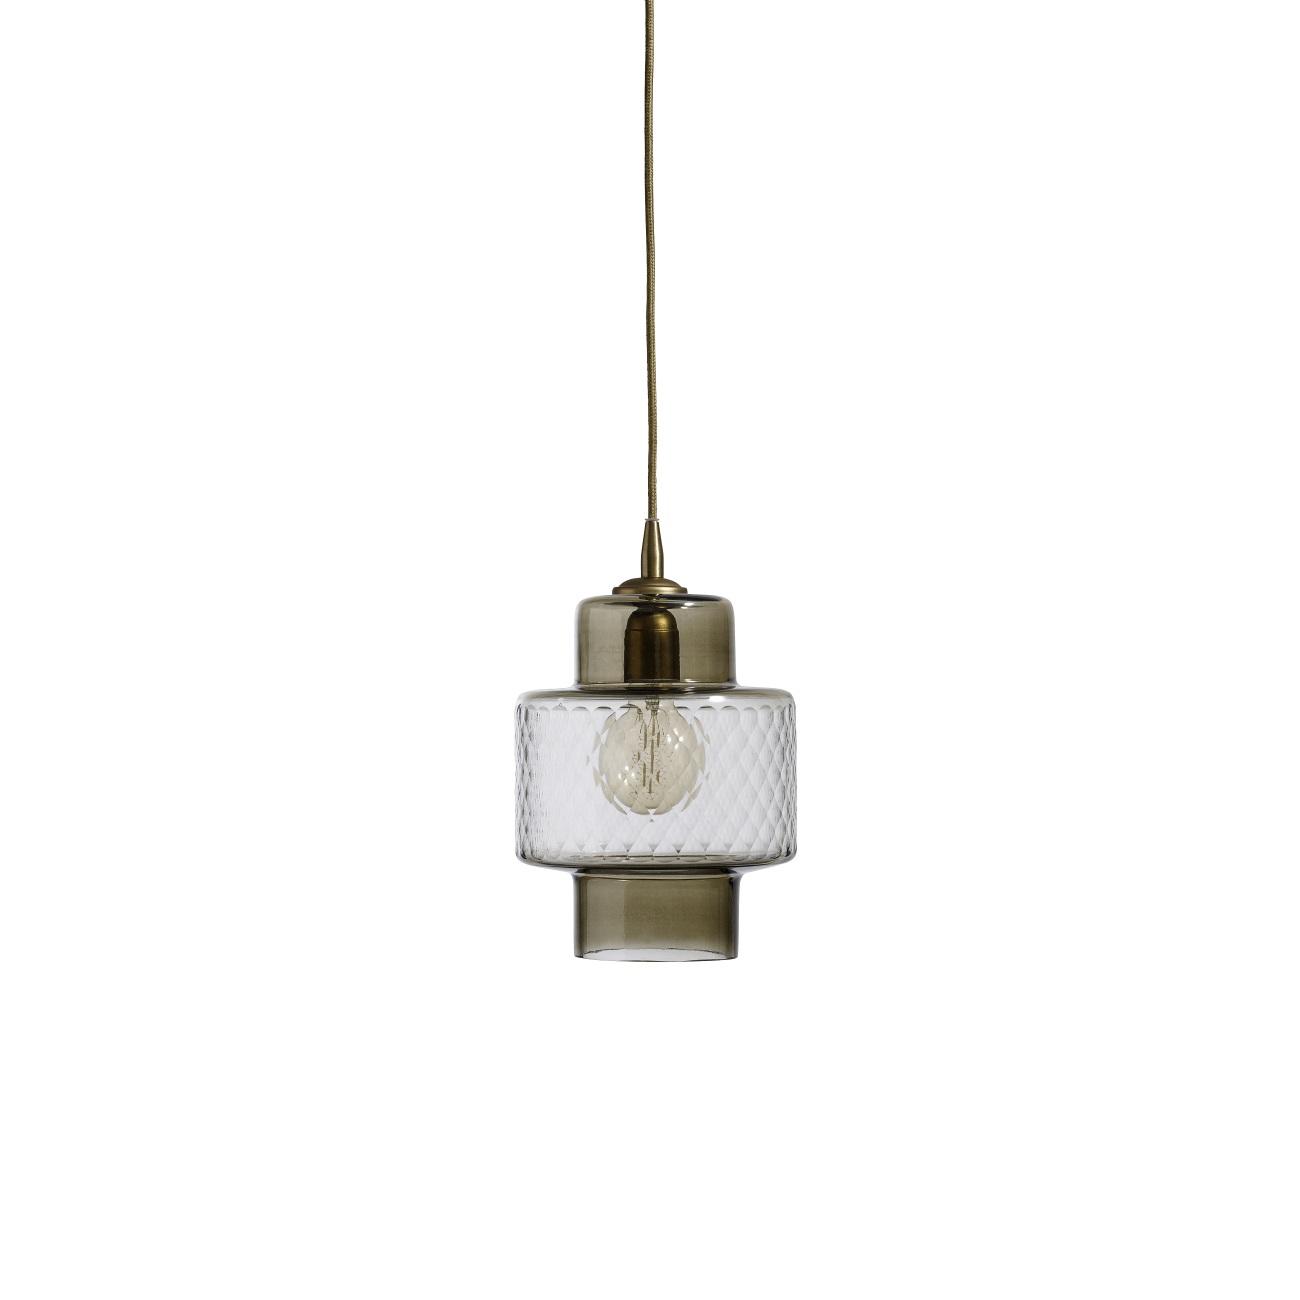 Lampa Smoke/ Cut glas, Nordal